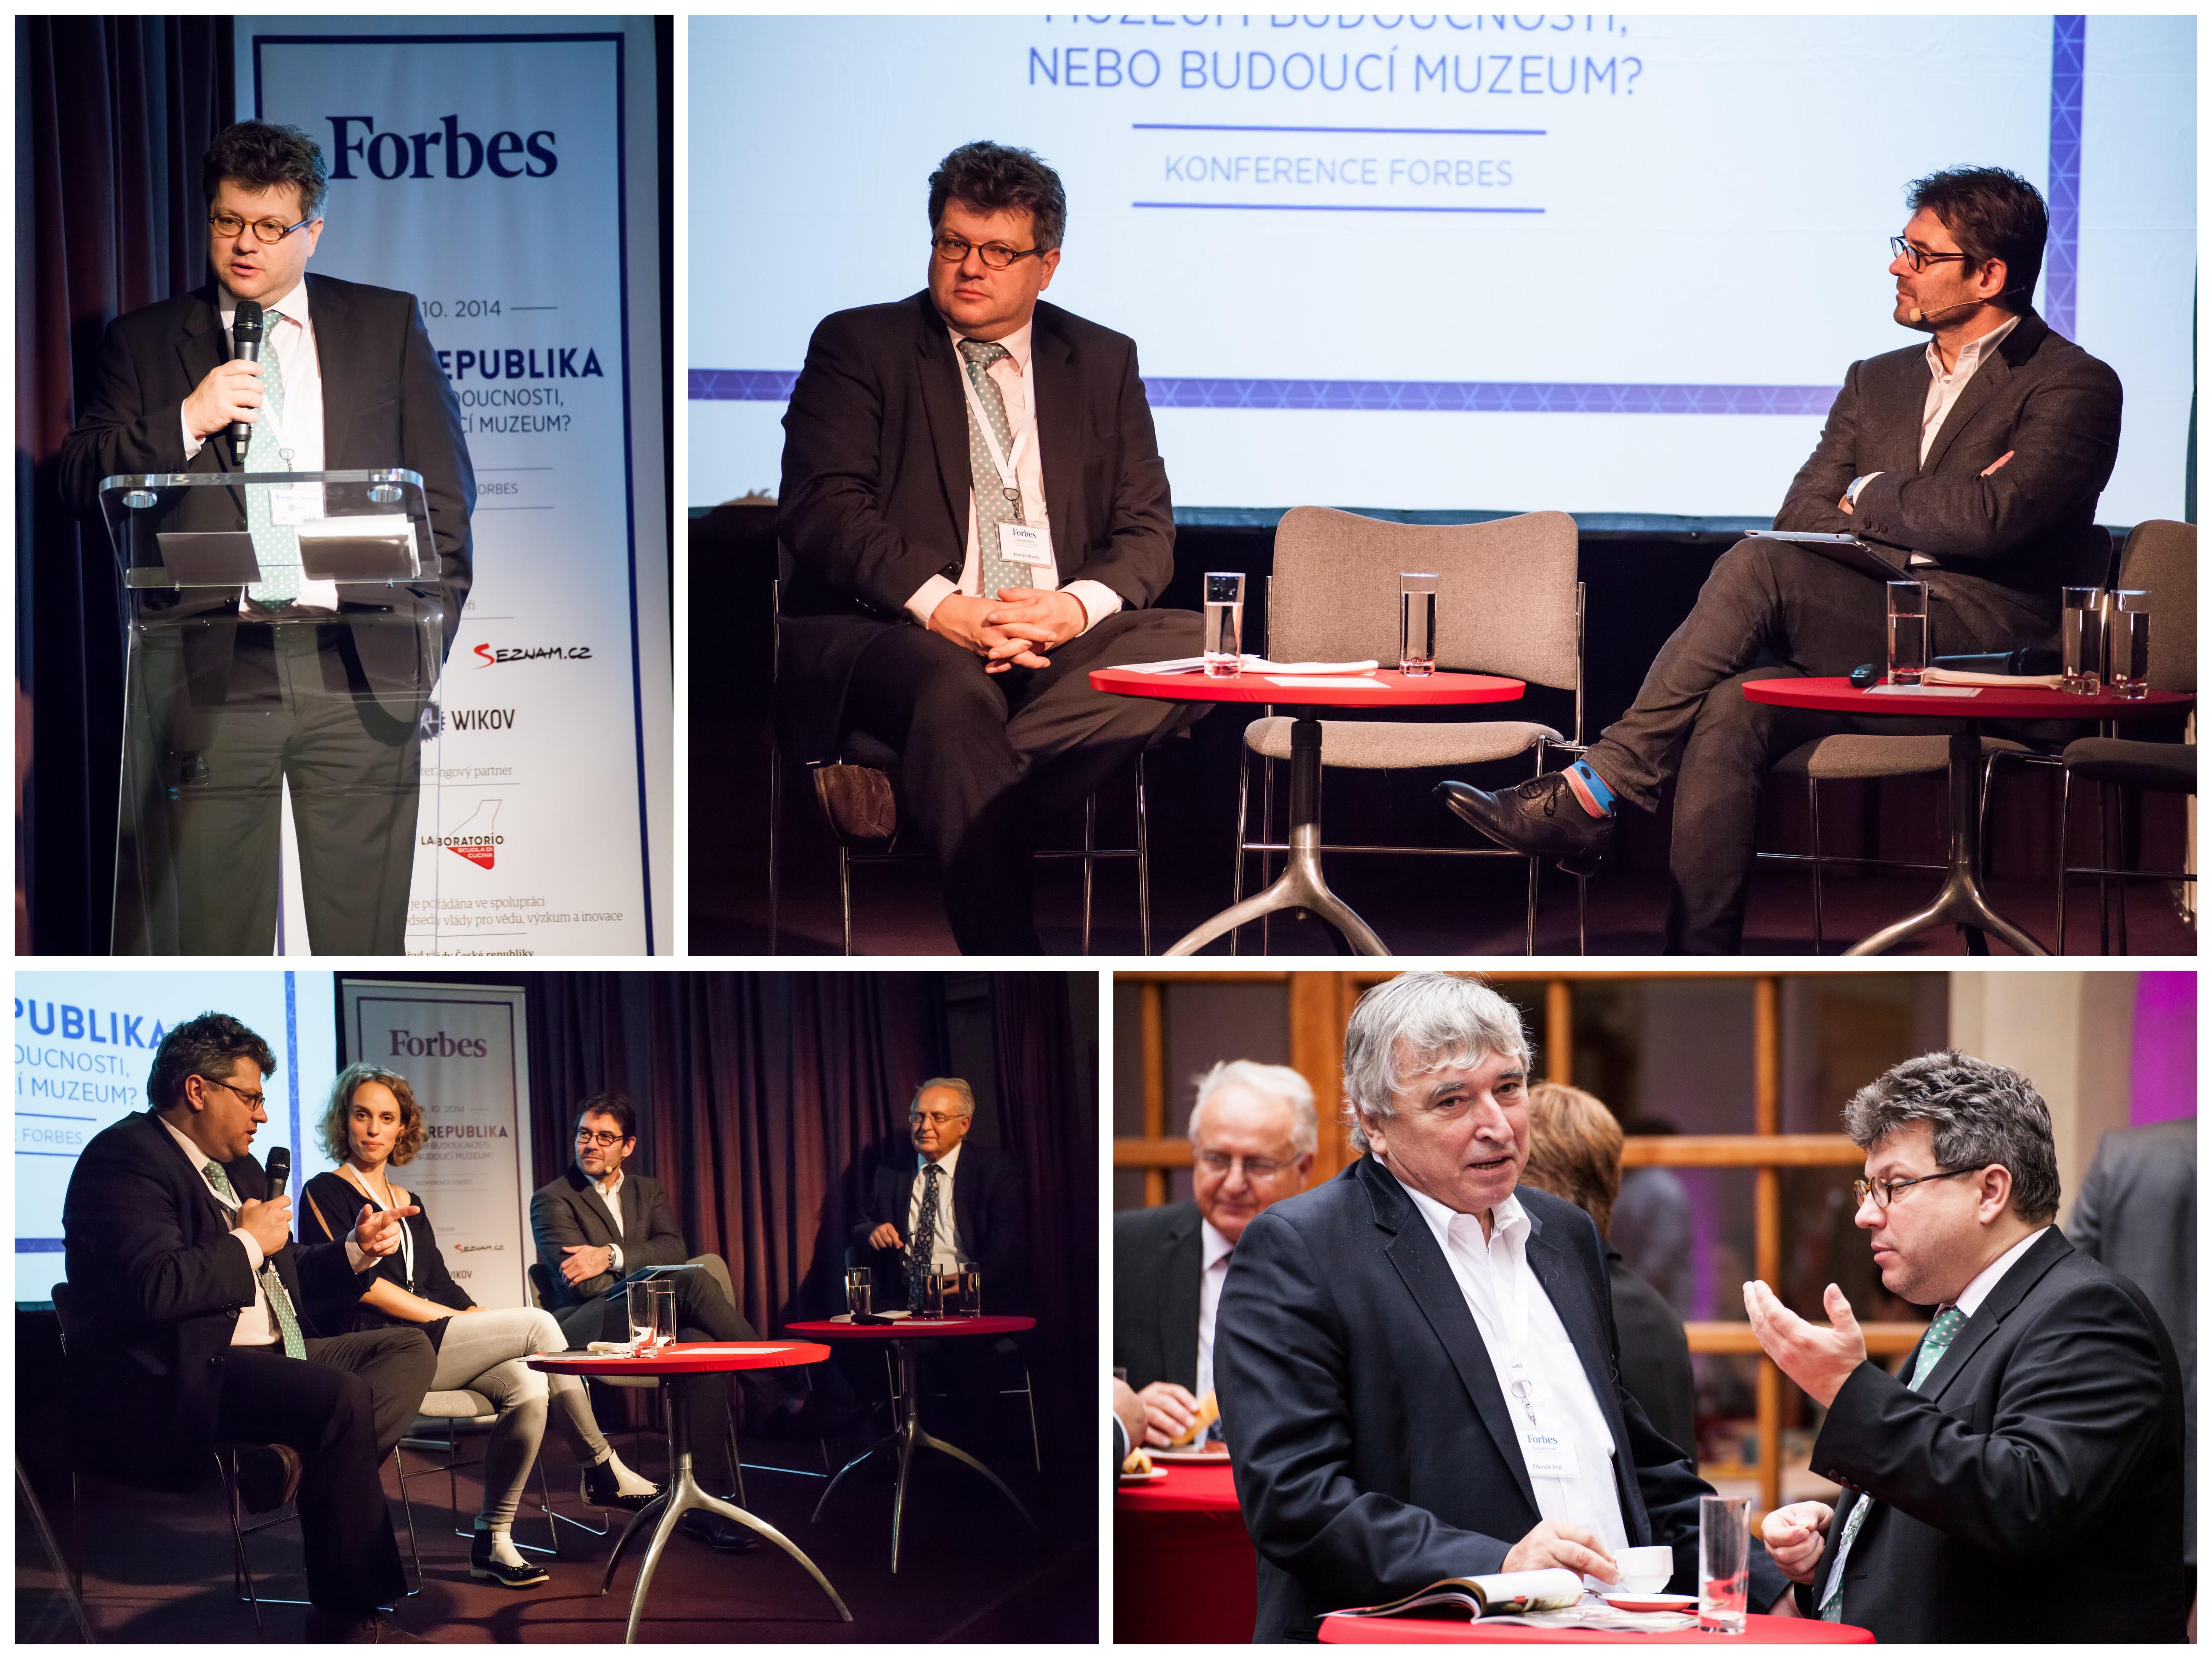 Konference Forbes 16.10.2014-86